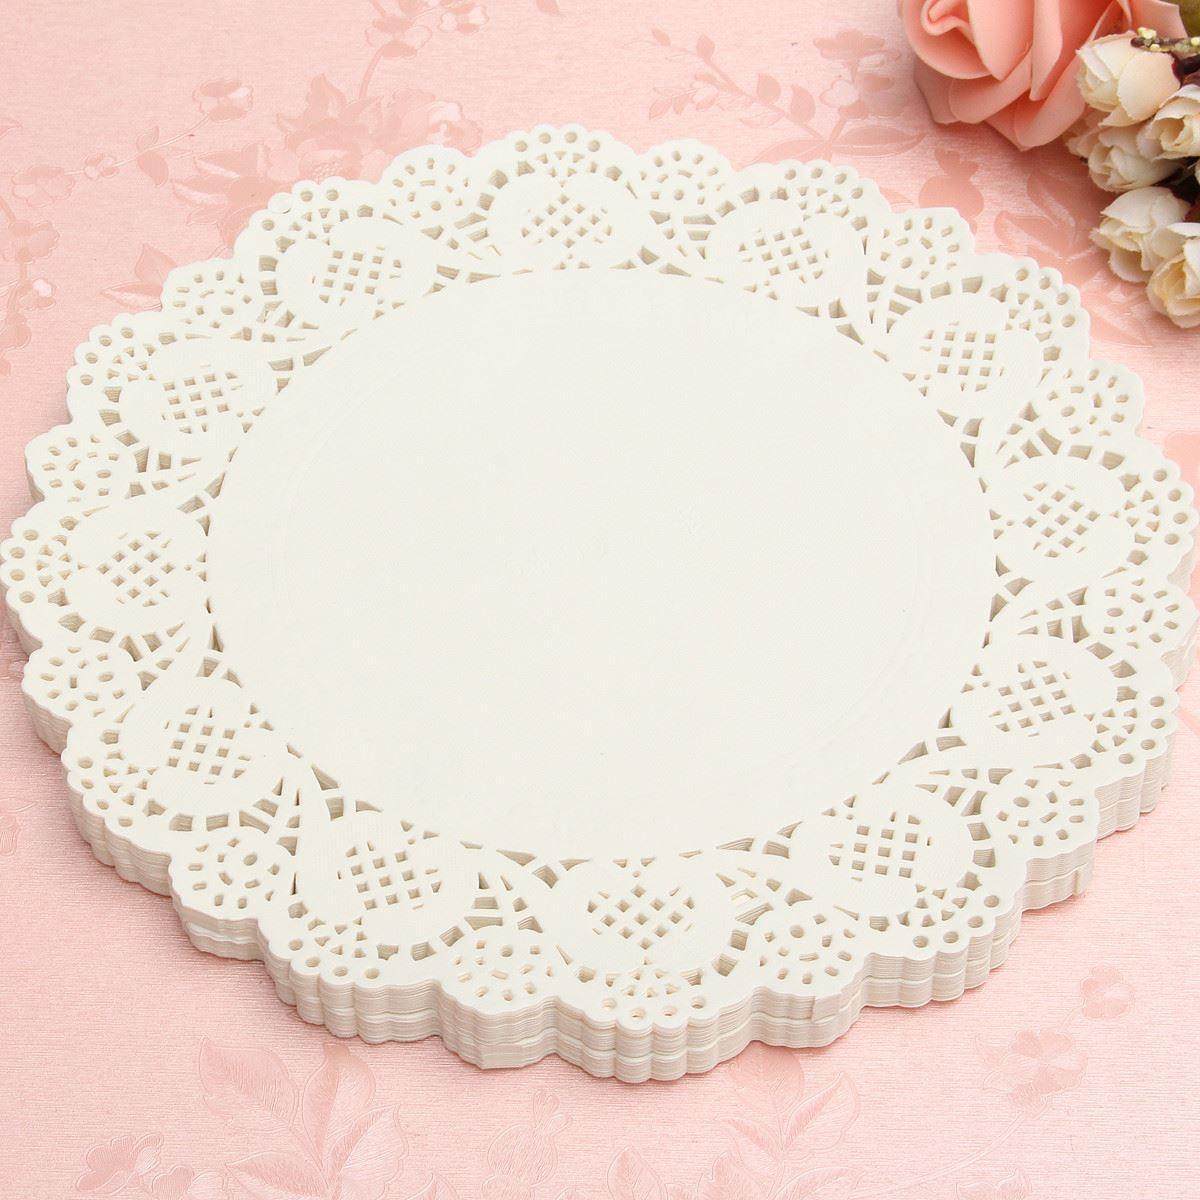 wholesale 120pcs white round